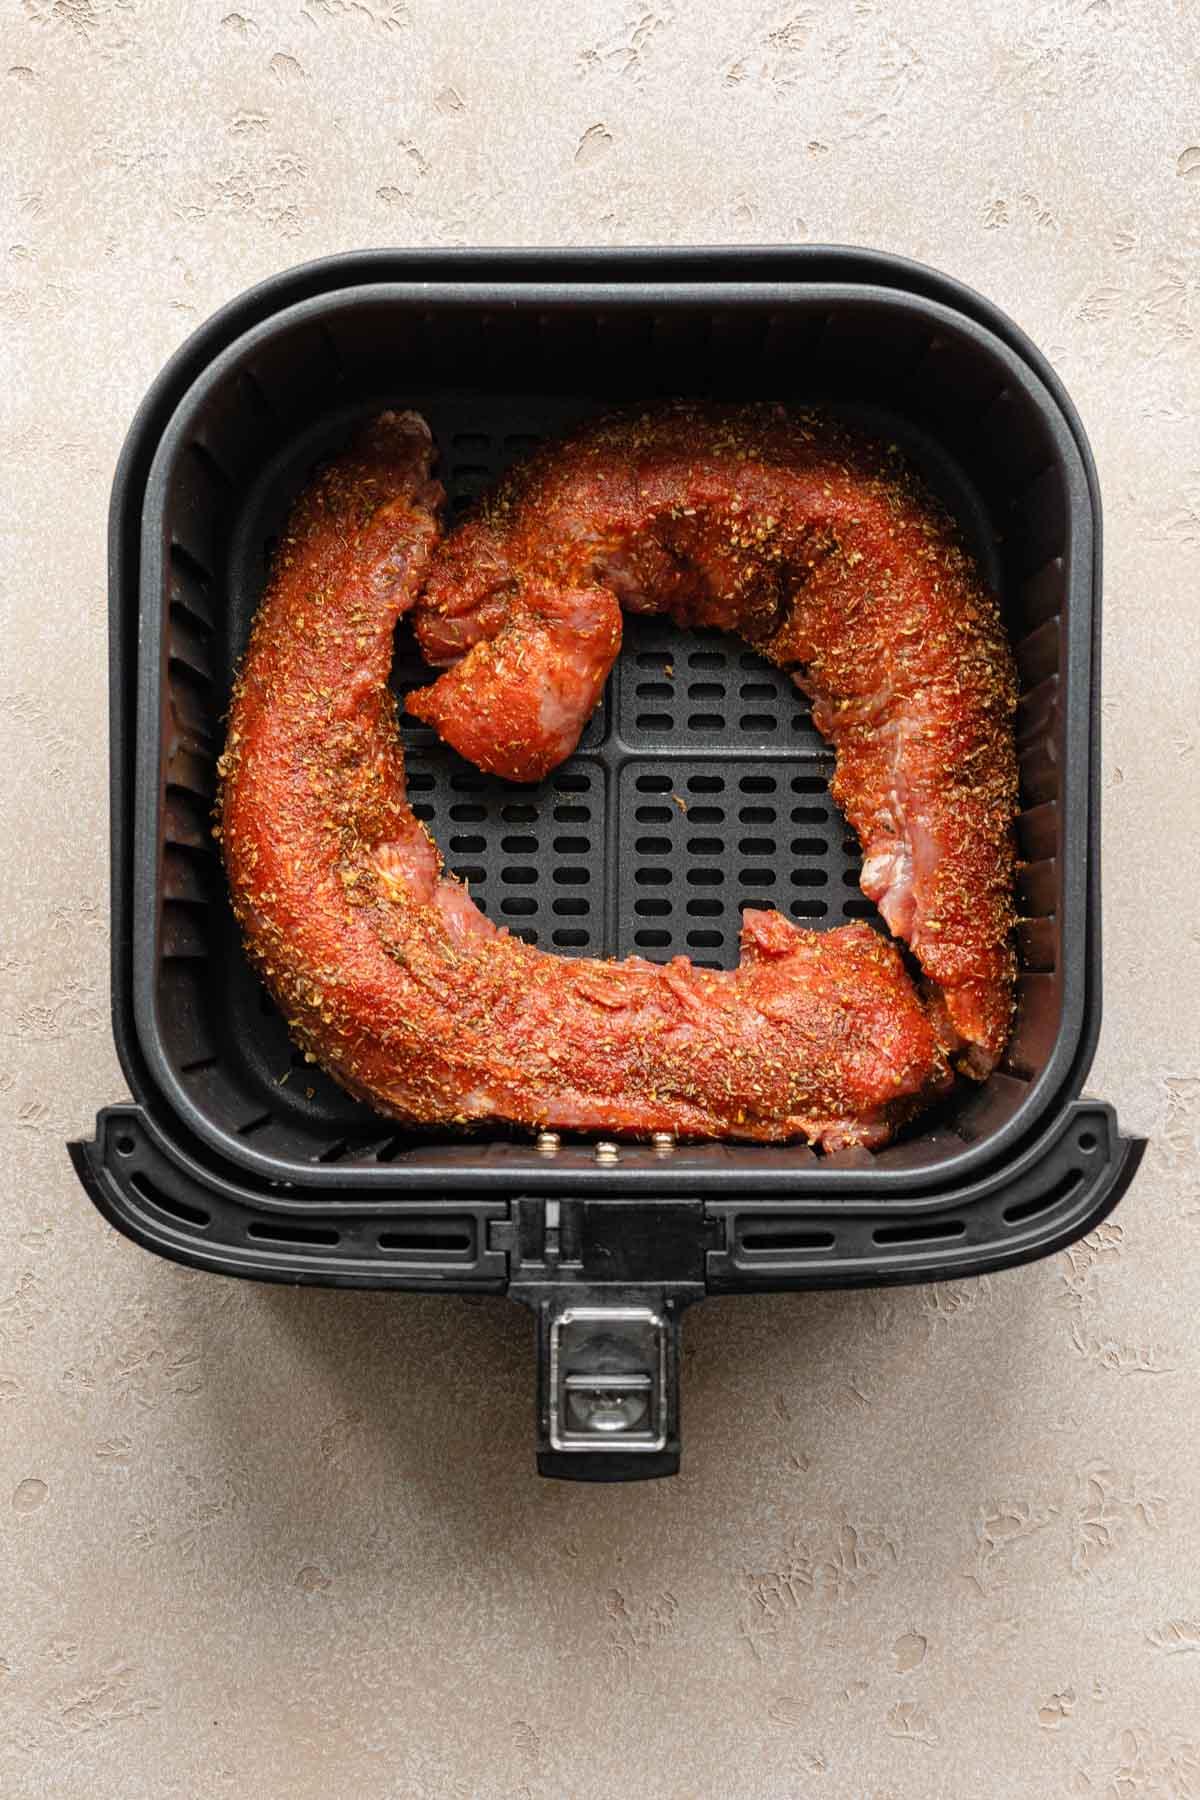 Two seasoned pork tenderloins in an air fryer basket.